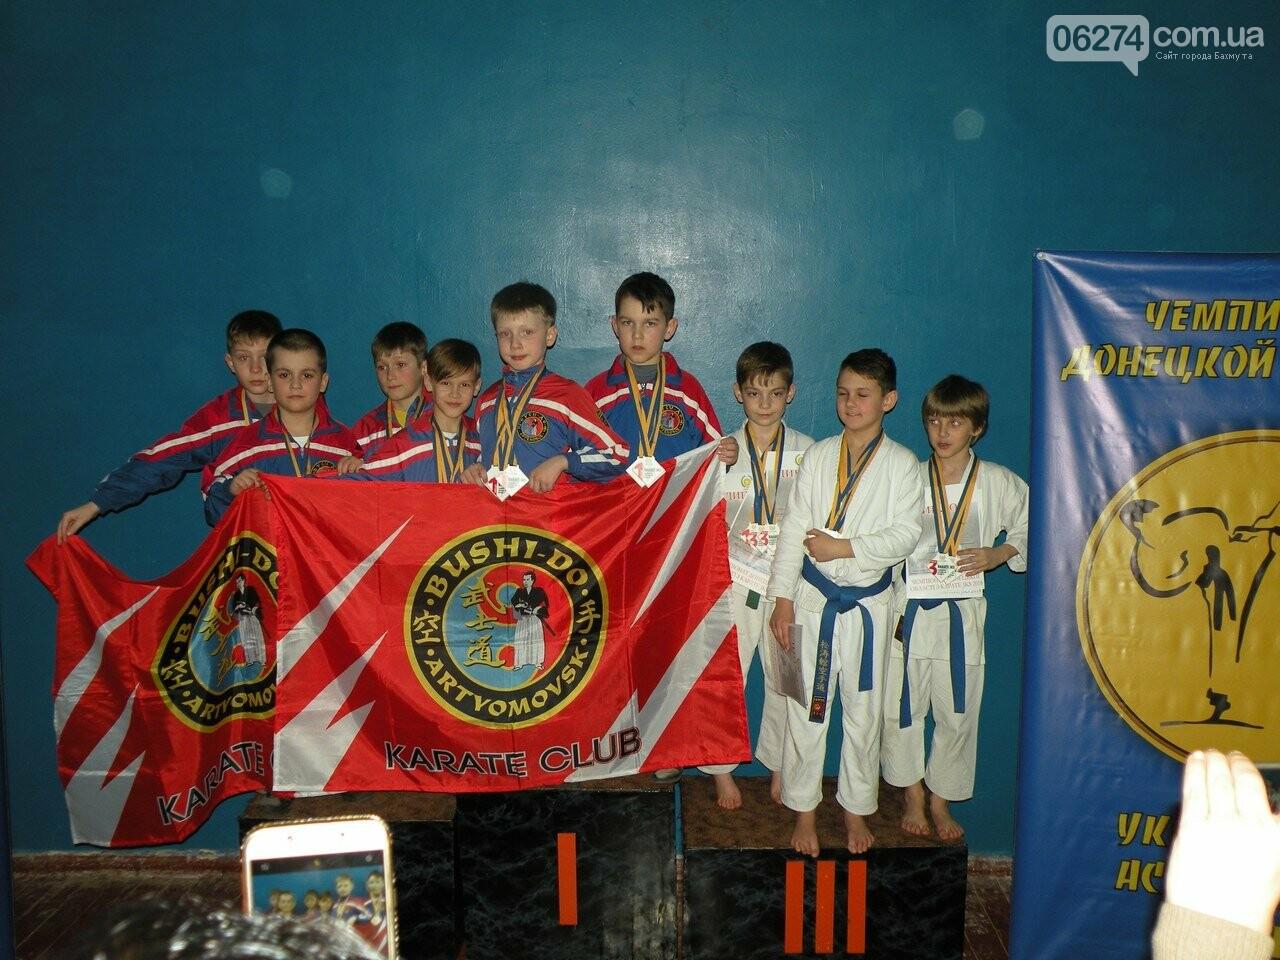 Каратисты Бахмута завоевали 73 медали на областном чемпионате, фото-6